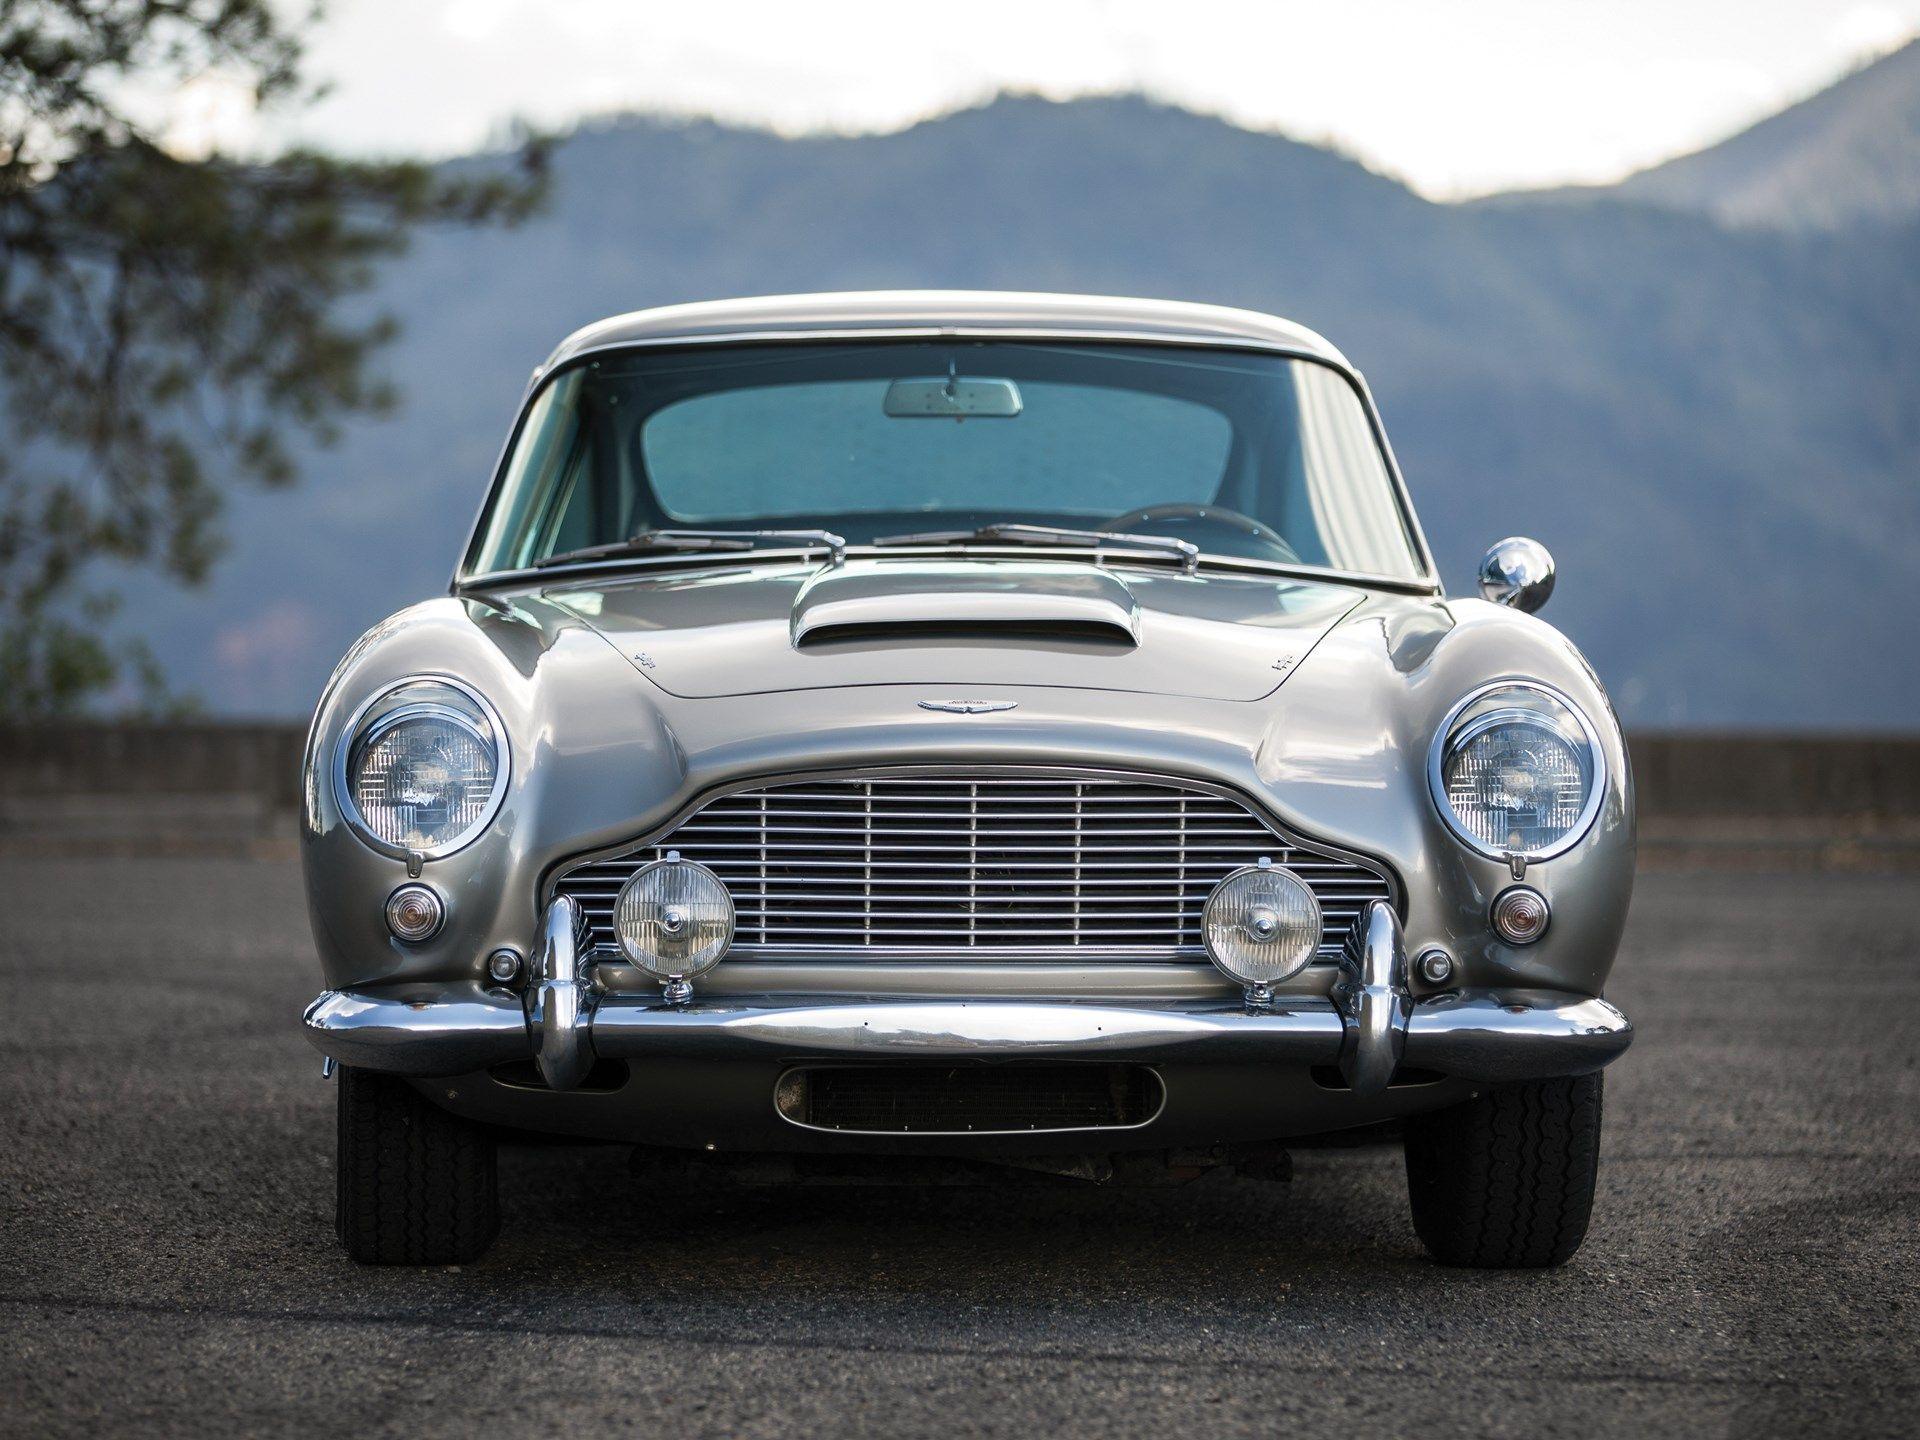 Автомобиль Джеймса Бонда ушел с молотка на аукционе в США за $6,4 млн